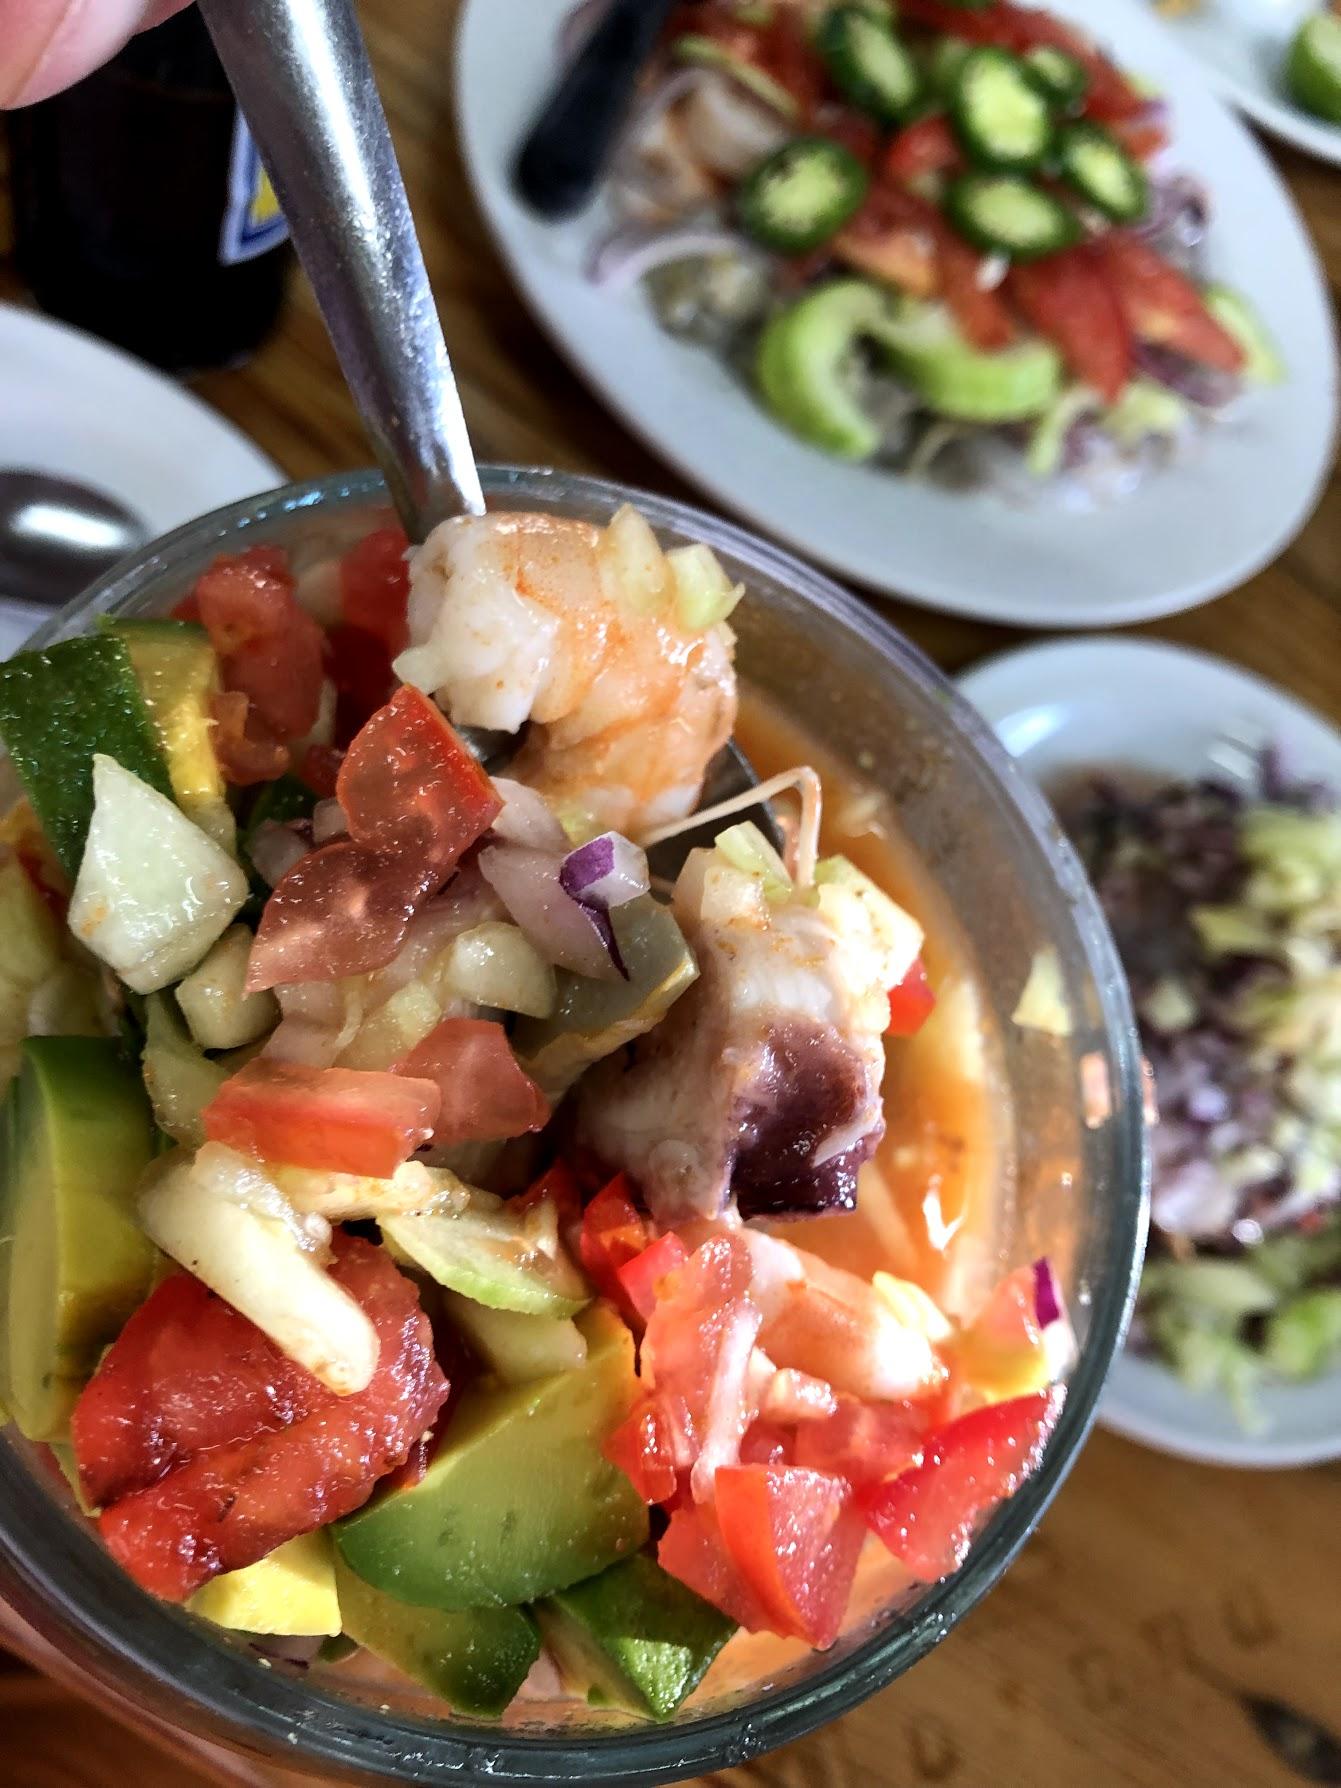 A mixed seafood coctailk @ El Toro G uero